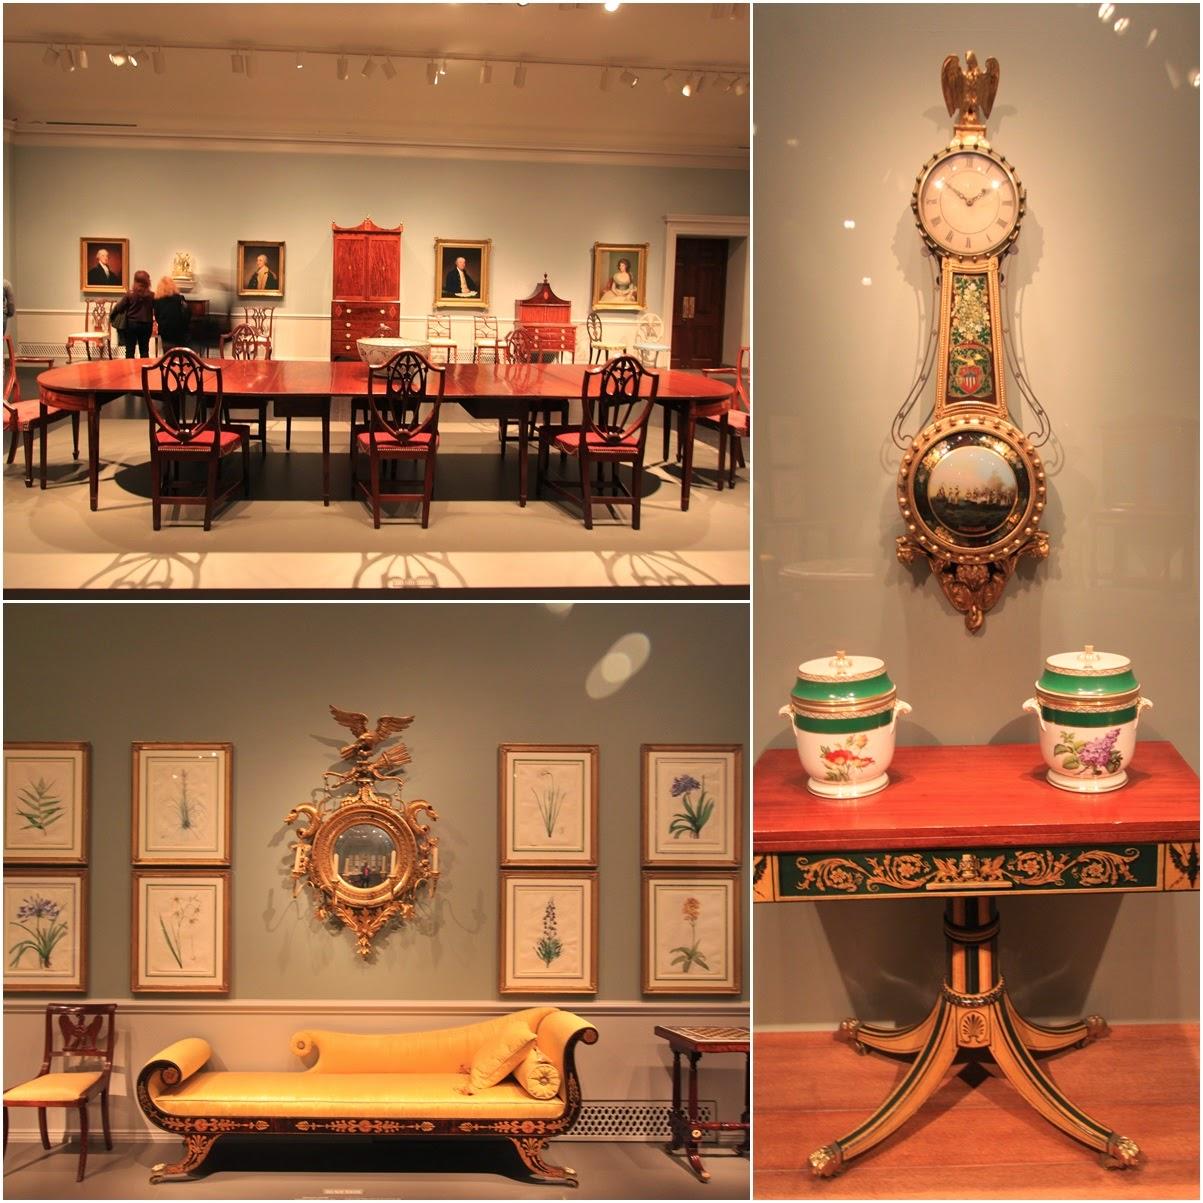 Smithsonian National Gallery Of Art, Washington DC